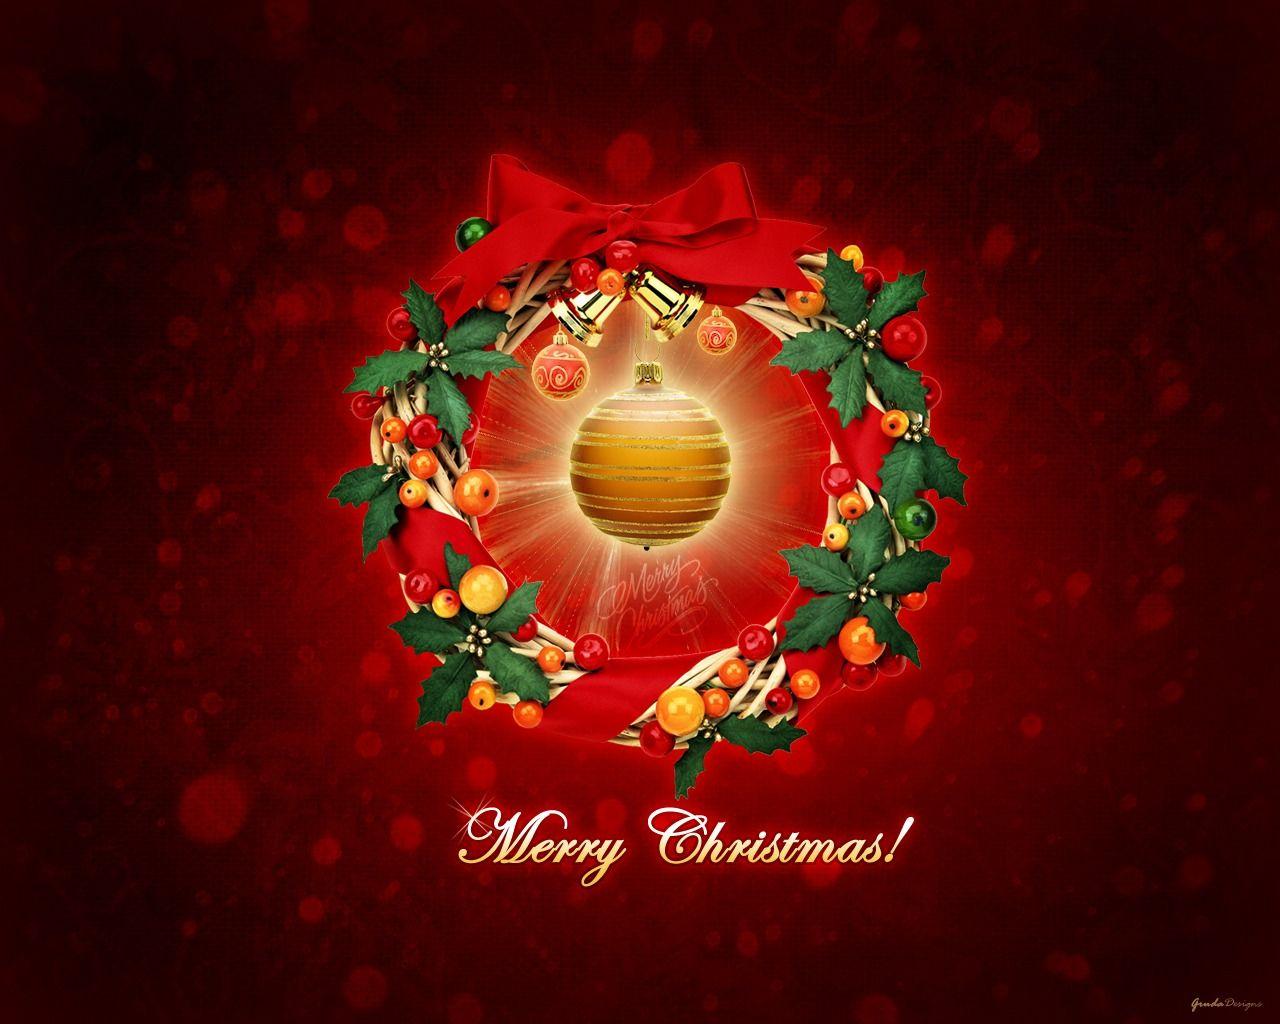 Christmas lyrics Christmas desktop wallpaper, Merry